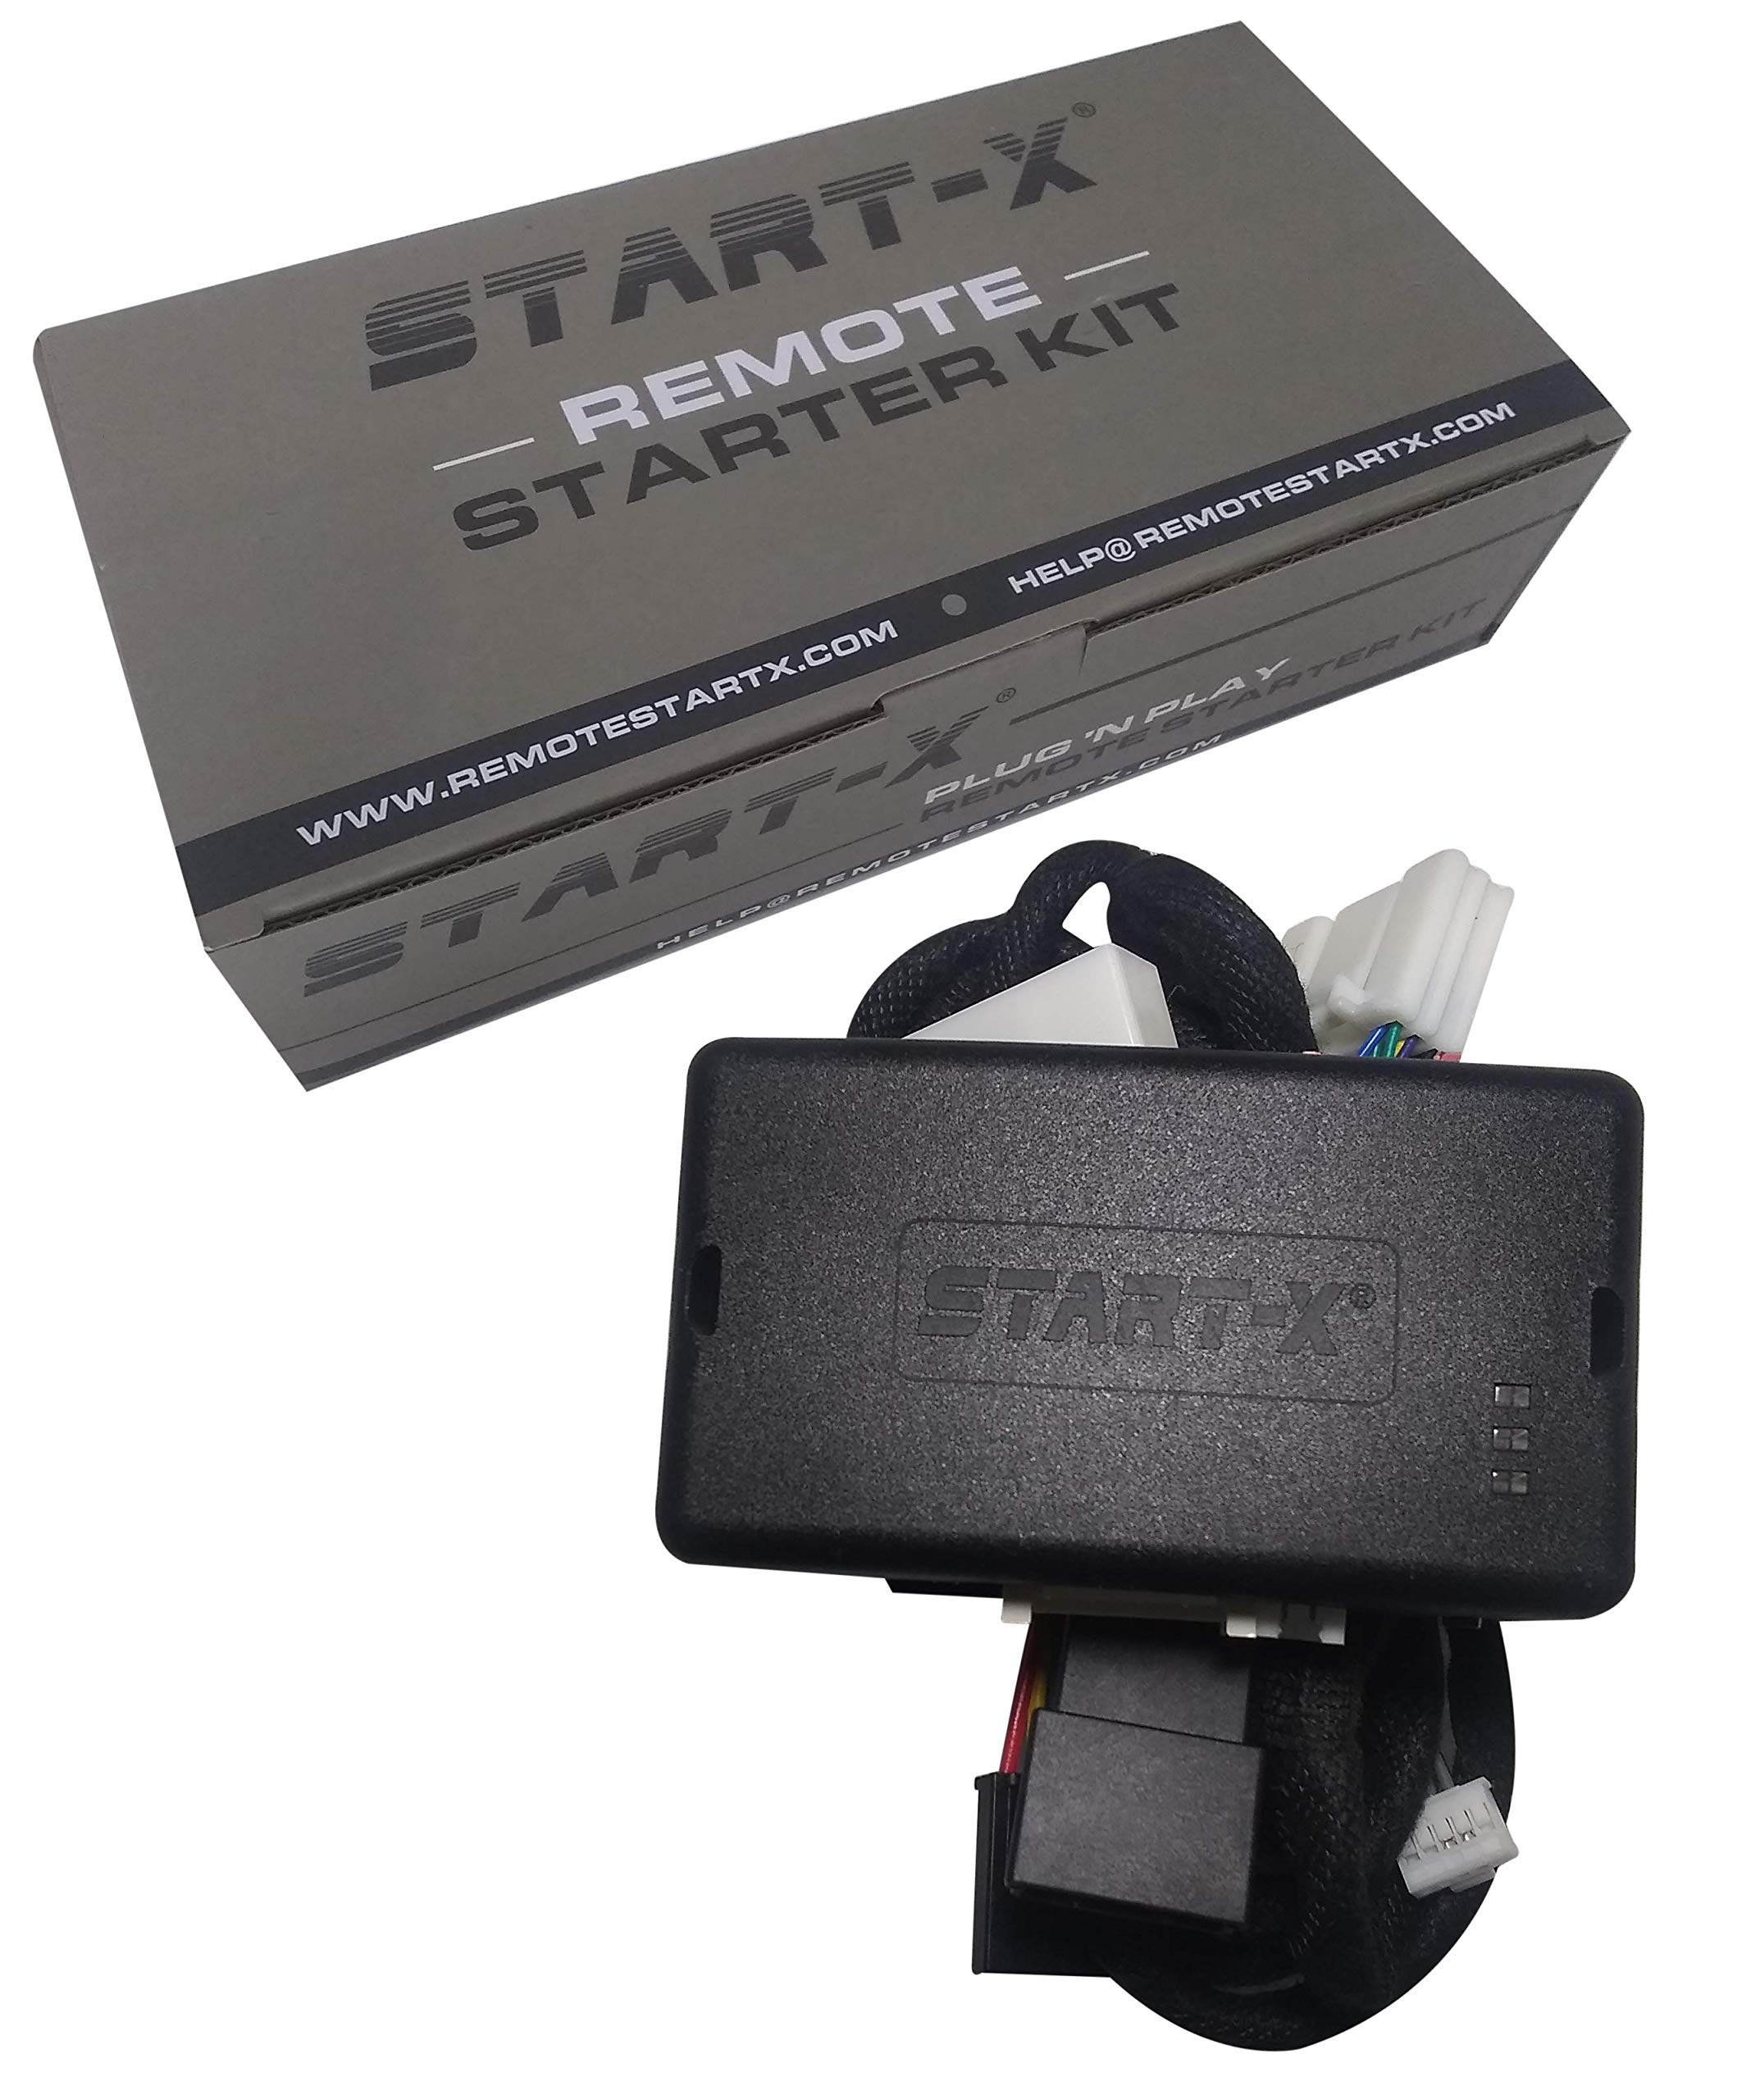 Start-X Plug N Play Remote Start Starter for Toyota Highlander 2014-2019, C-HR 2018-2019, Land Cruiser 2016-2018 || Push to Start Only || Lock 3X to Remote Start by Start-X